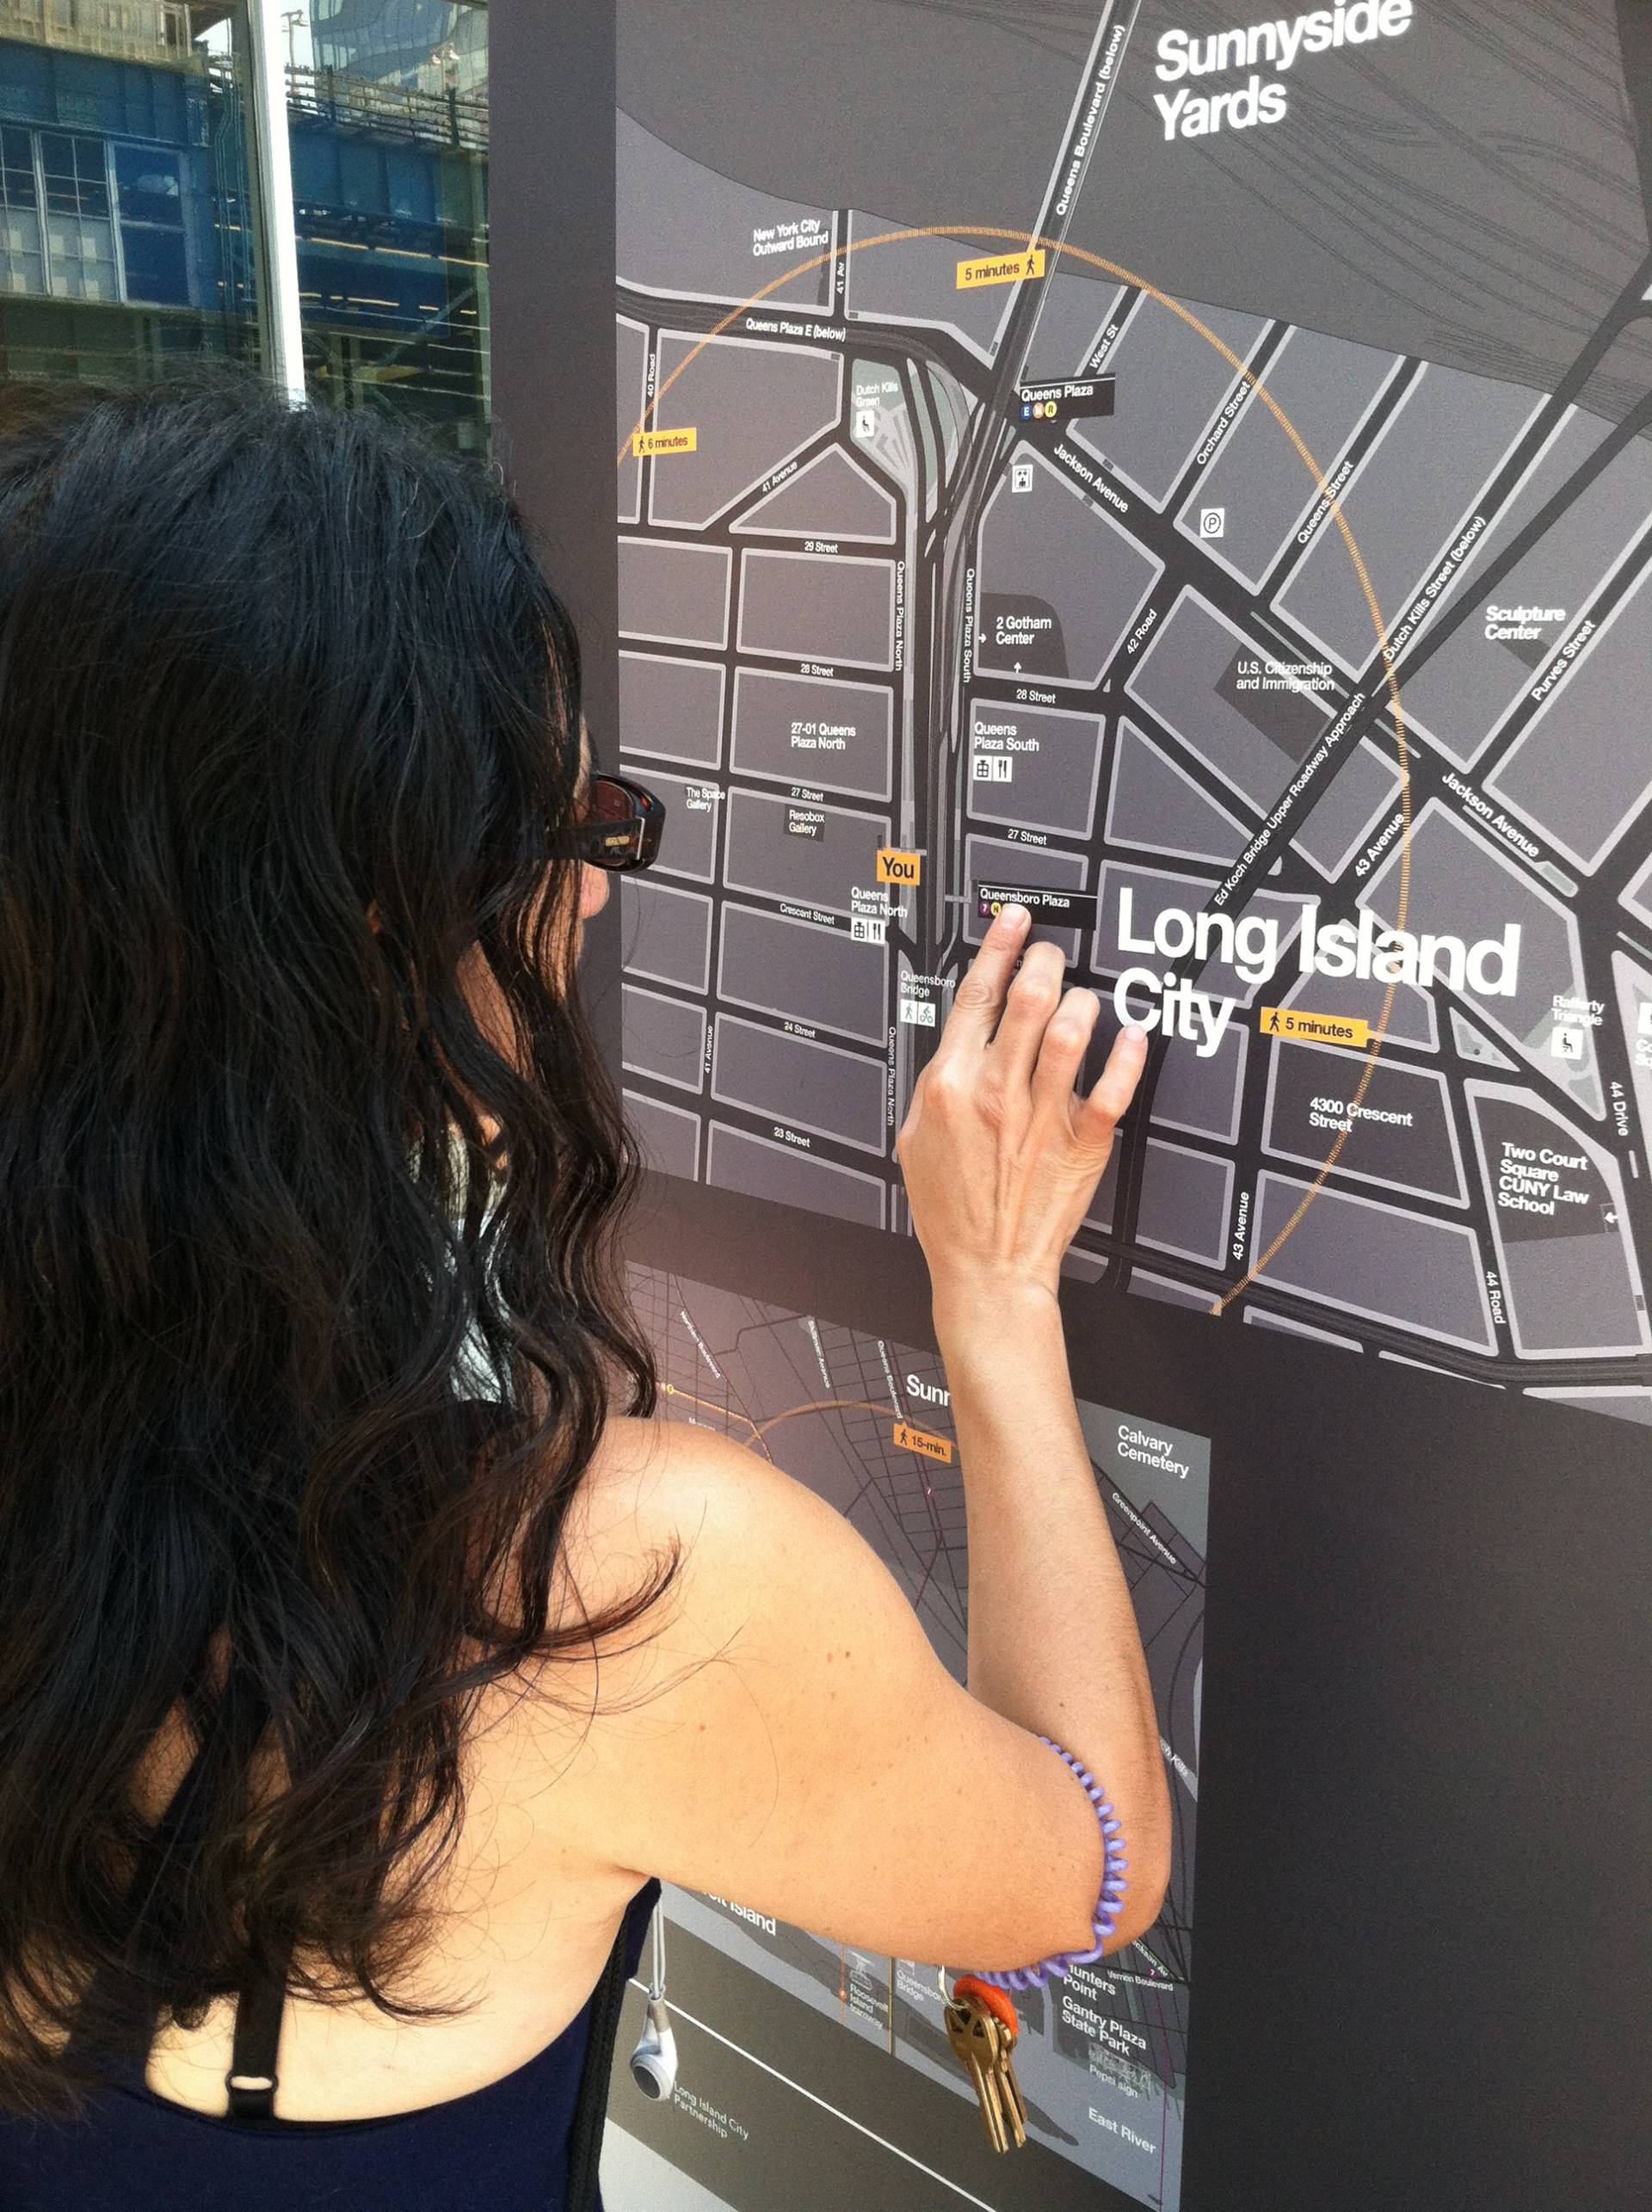 NYC Pedestrian Wayfinding System